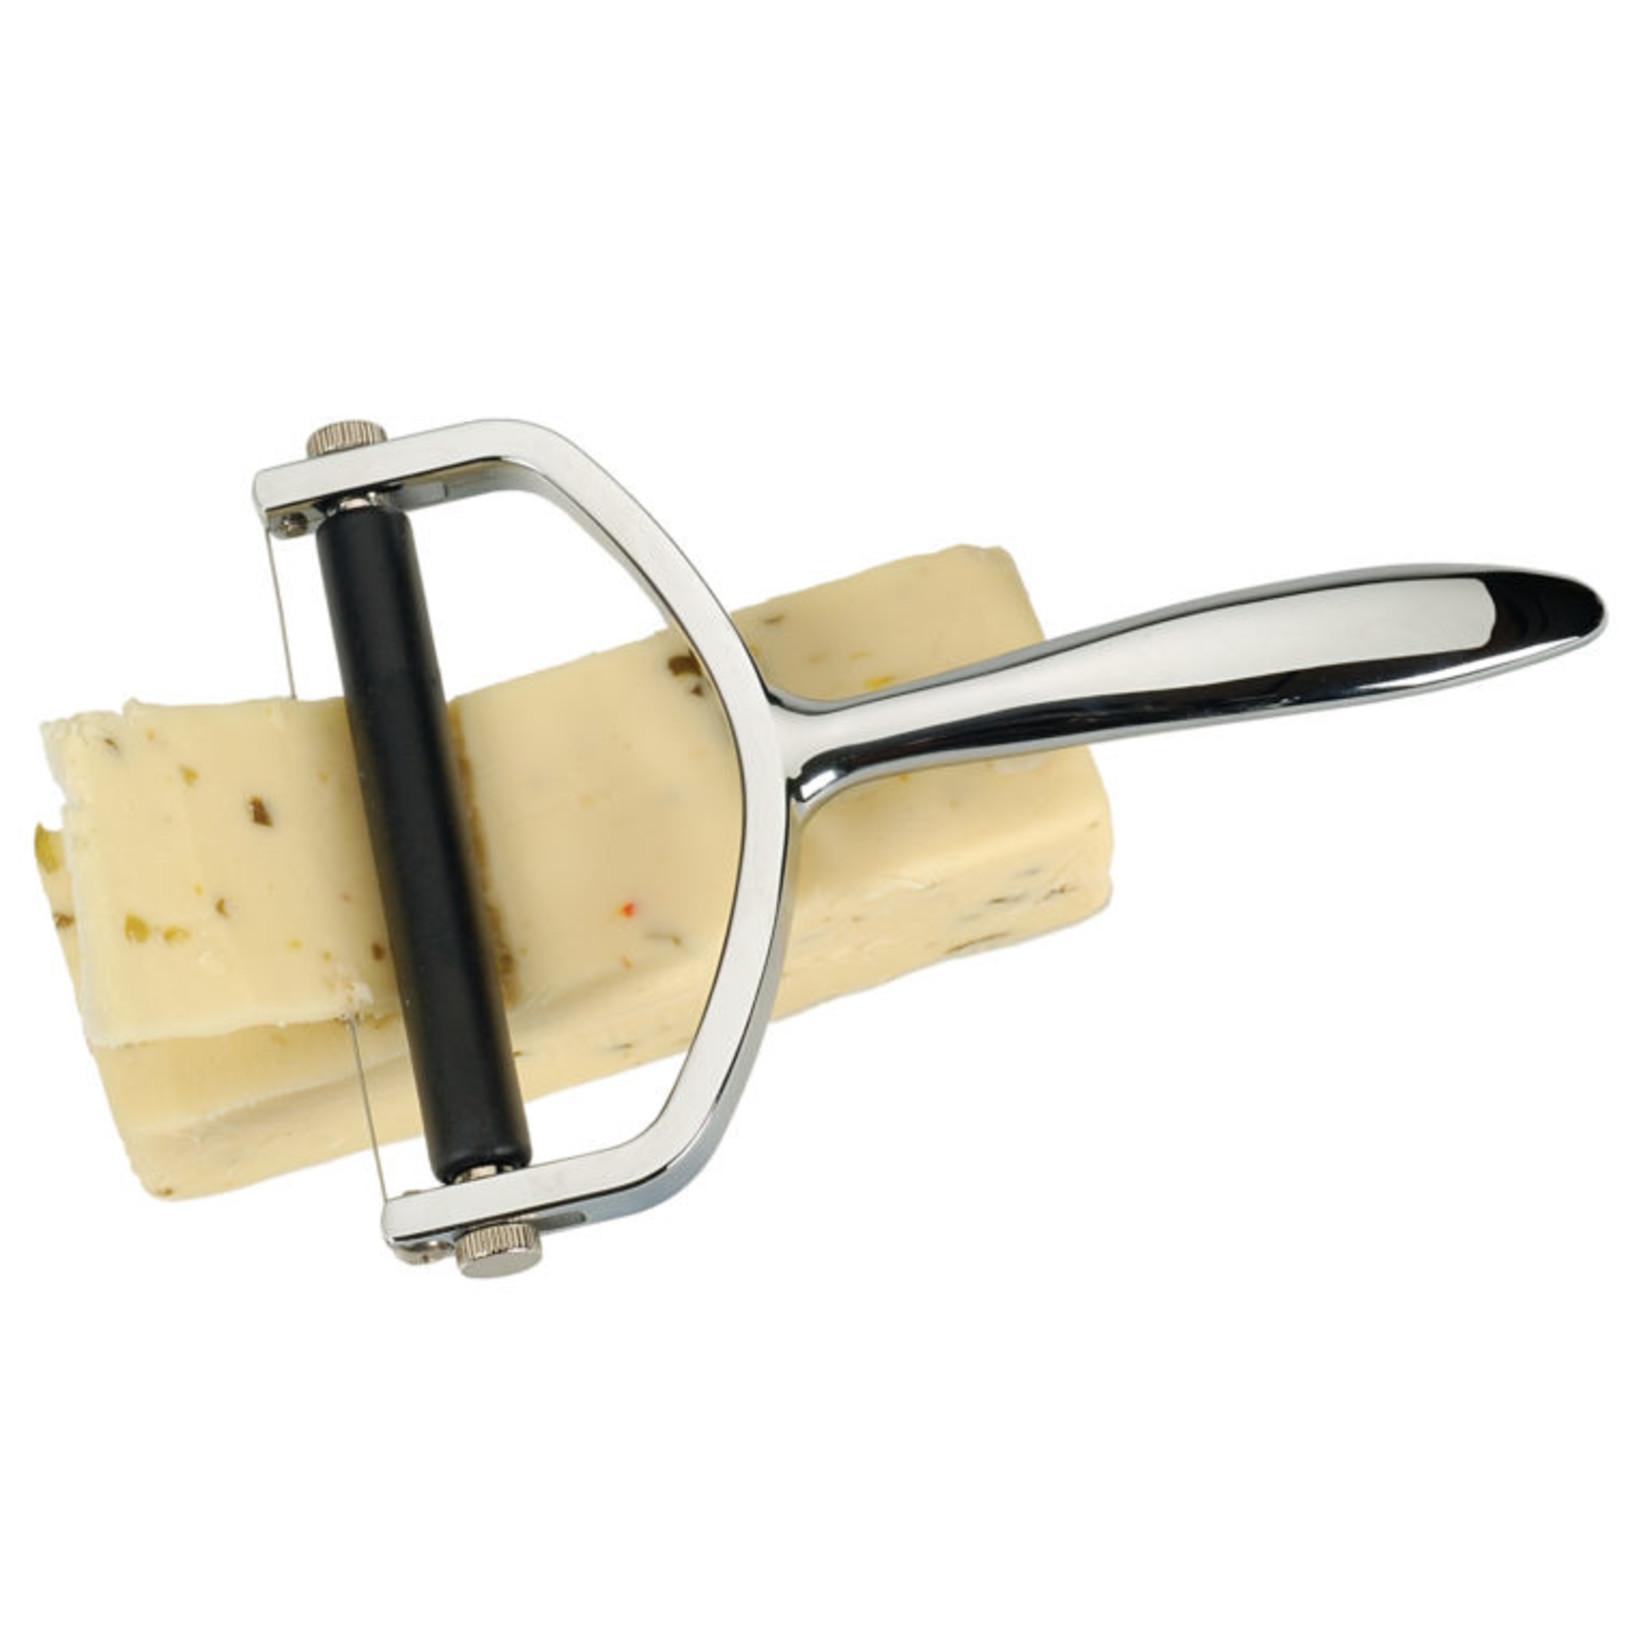 RSVP International Cheese Slicer